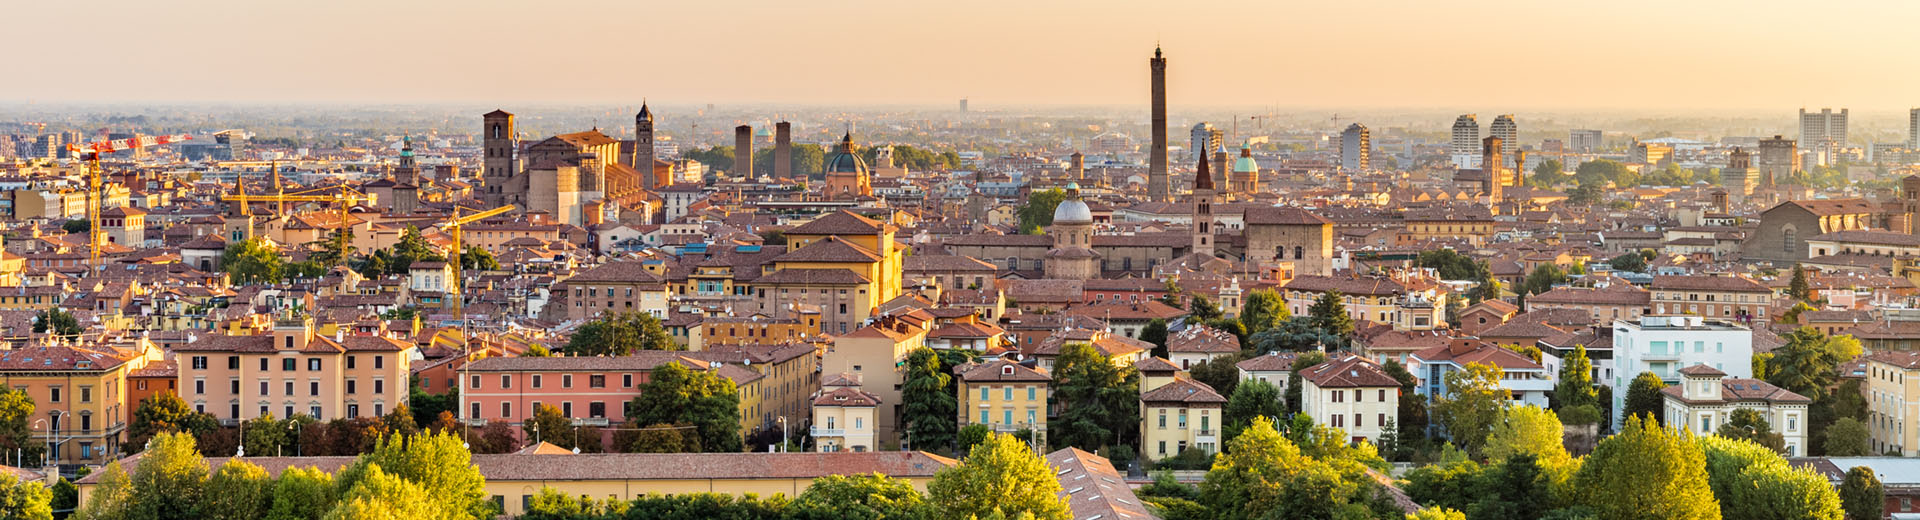 Kleingruppenreise Emilia Romagna